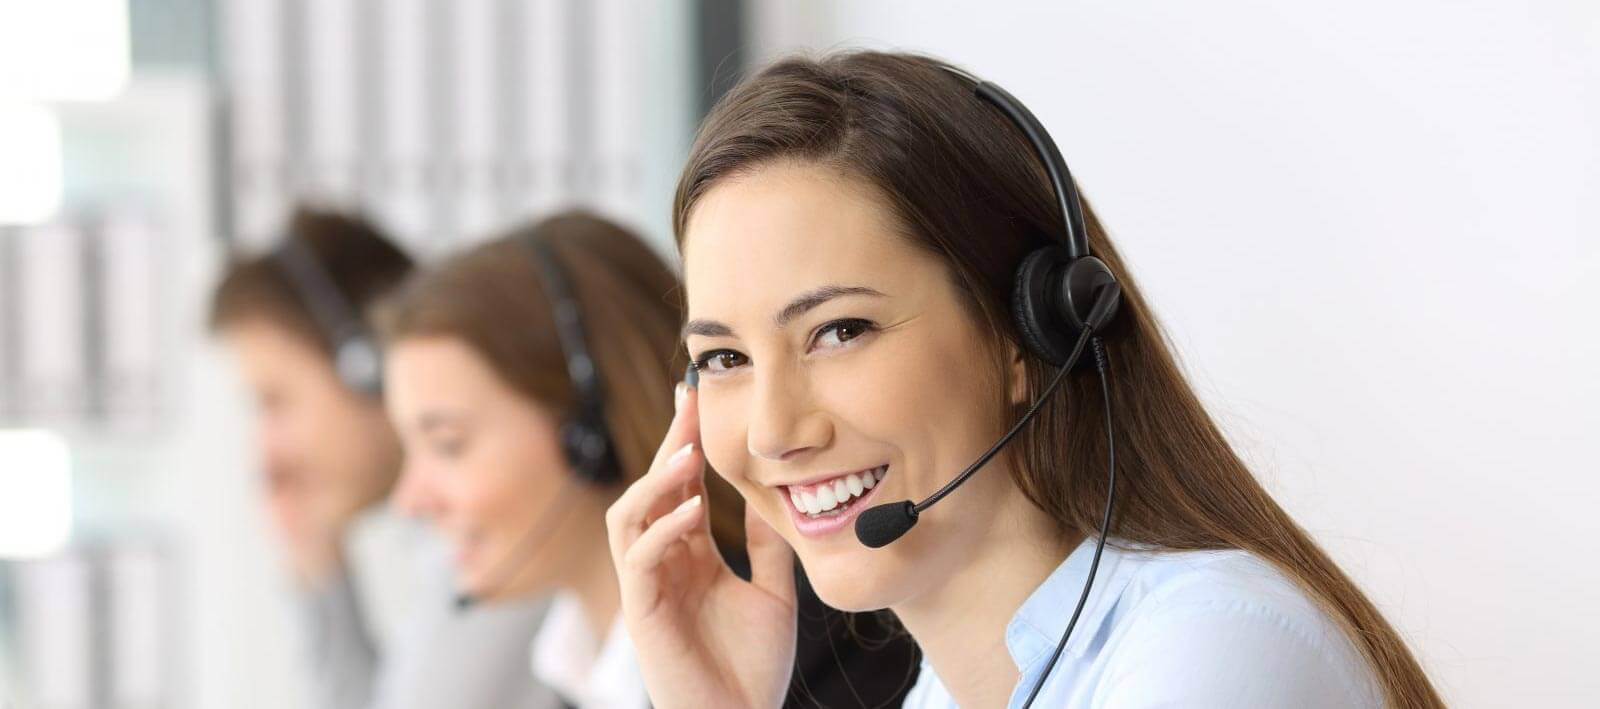 Commercial Intruder Alarm Installation Maintenance Sds Security